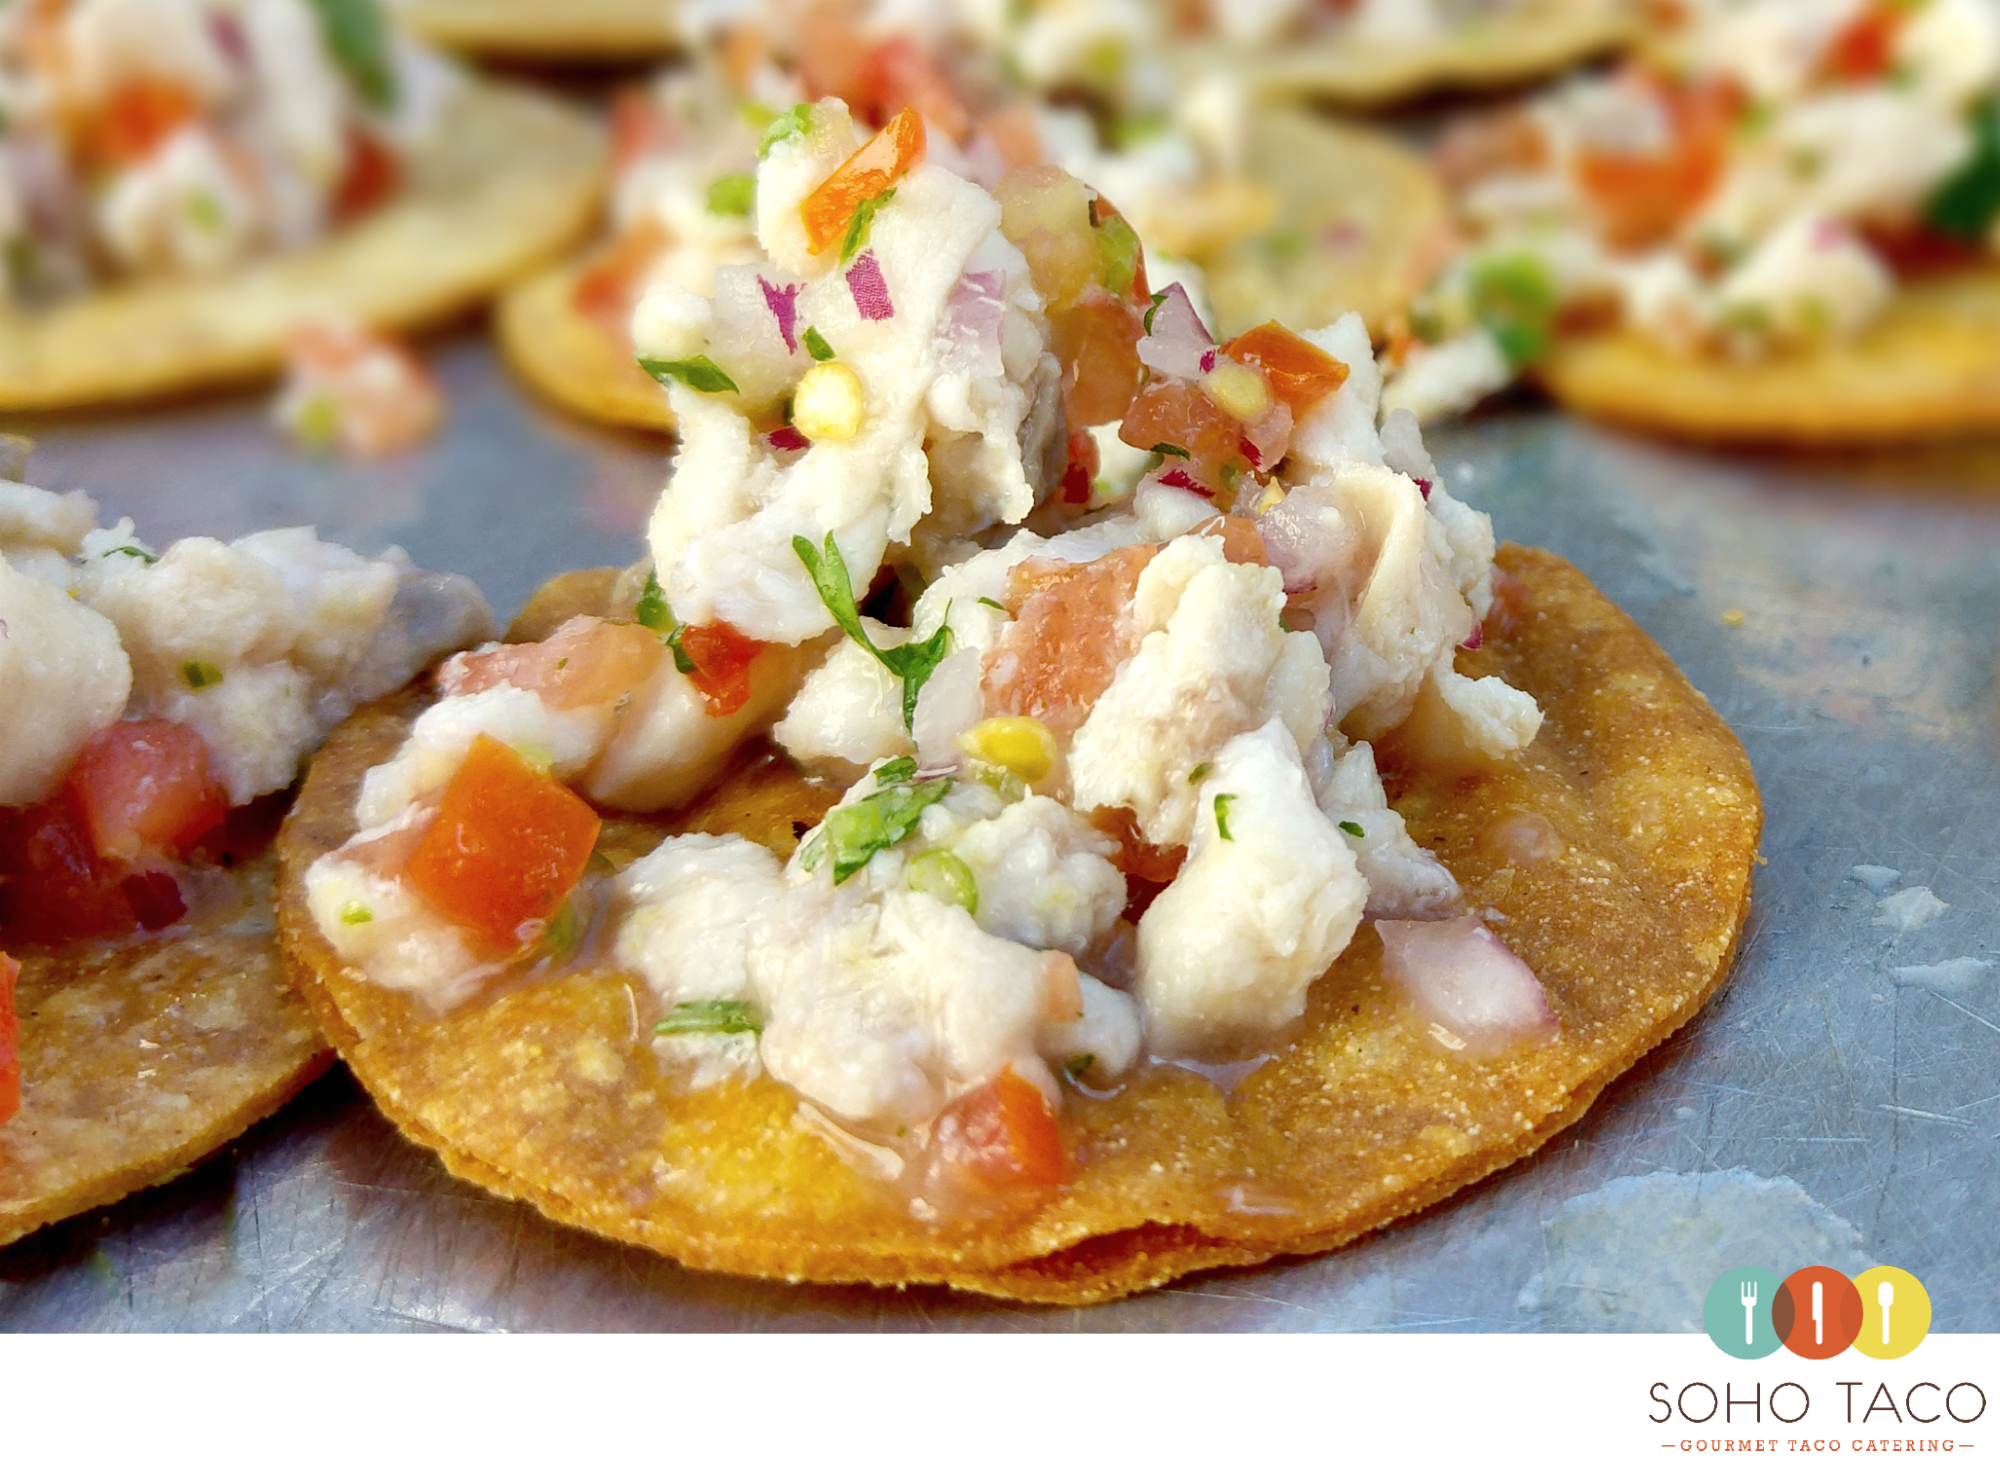 SOHO TACO Gourmet Taco Catering - Rancho Buena Vista Adobe - Wedding - Ceviche - Appetizers